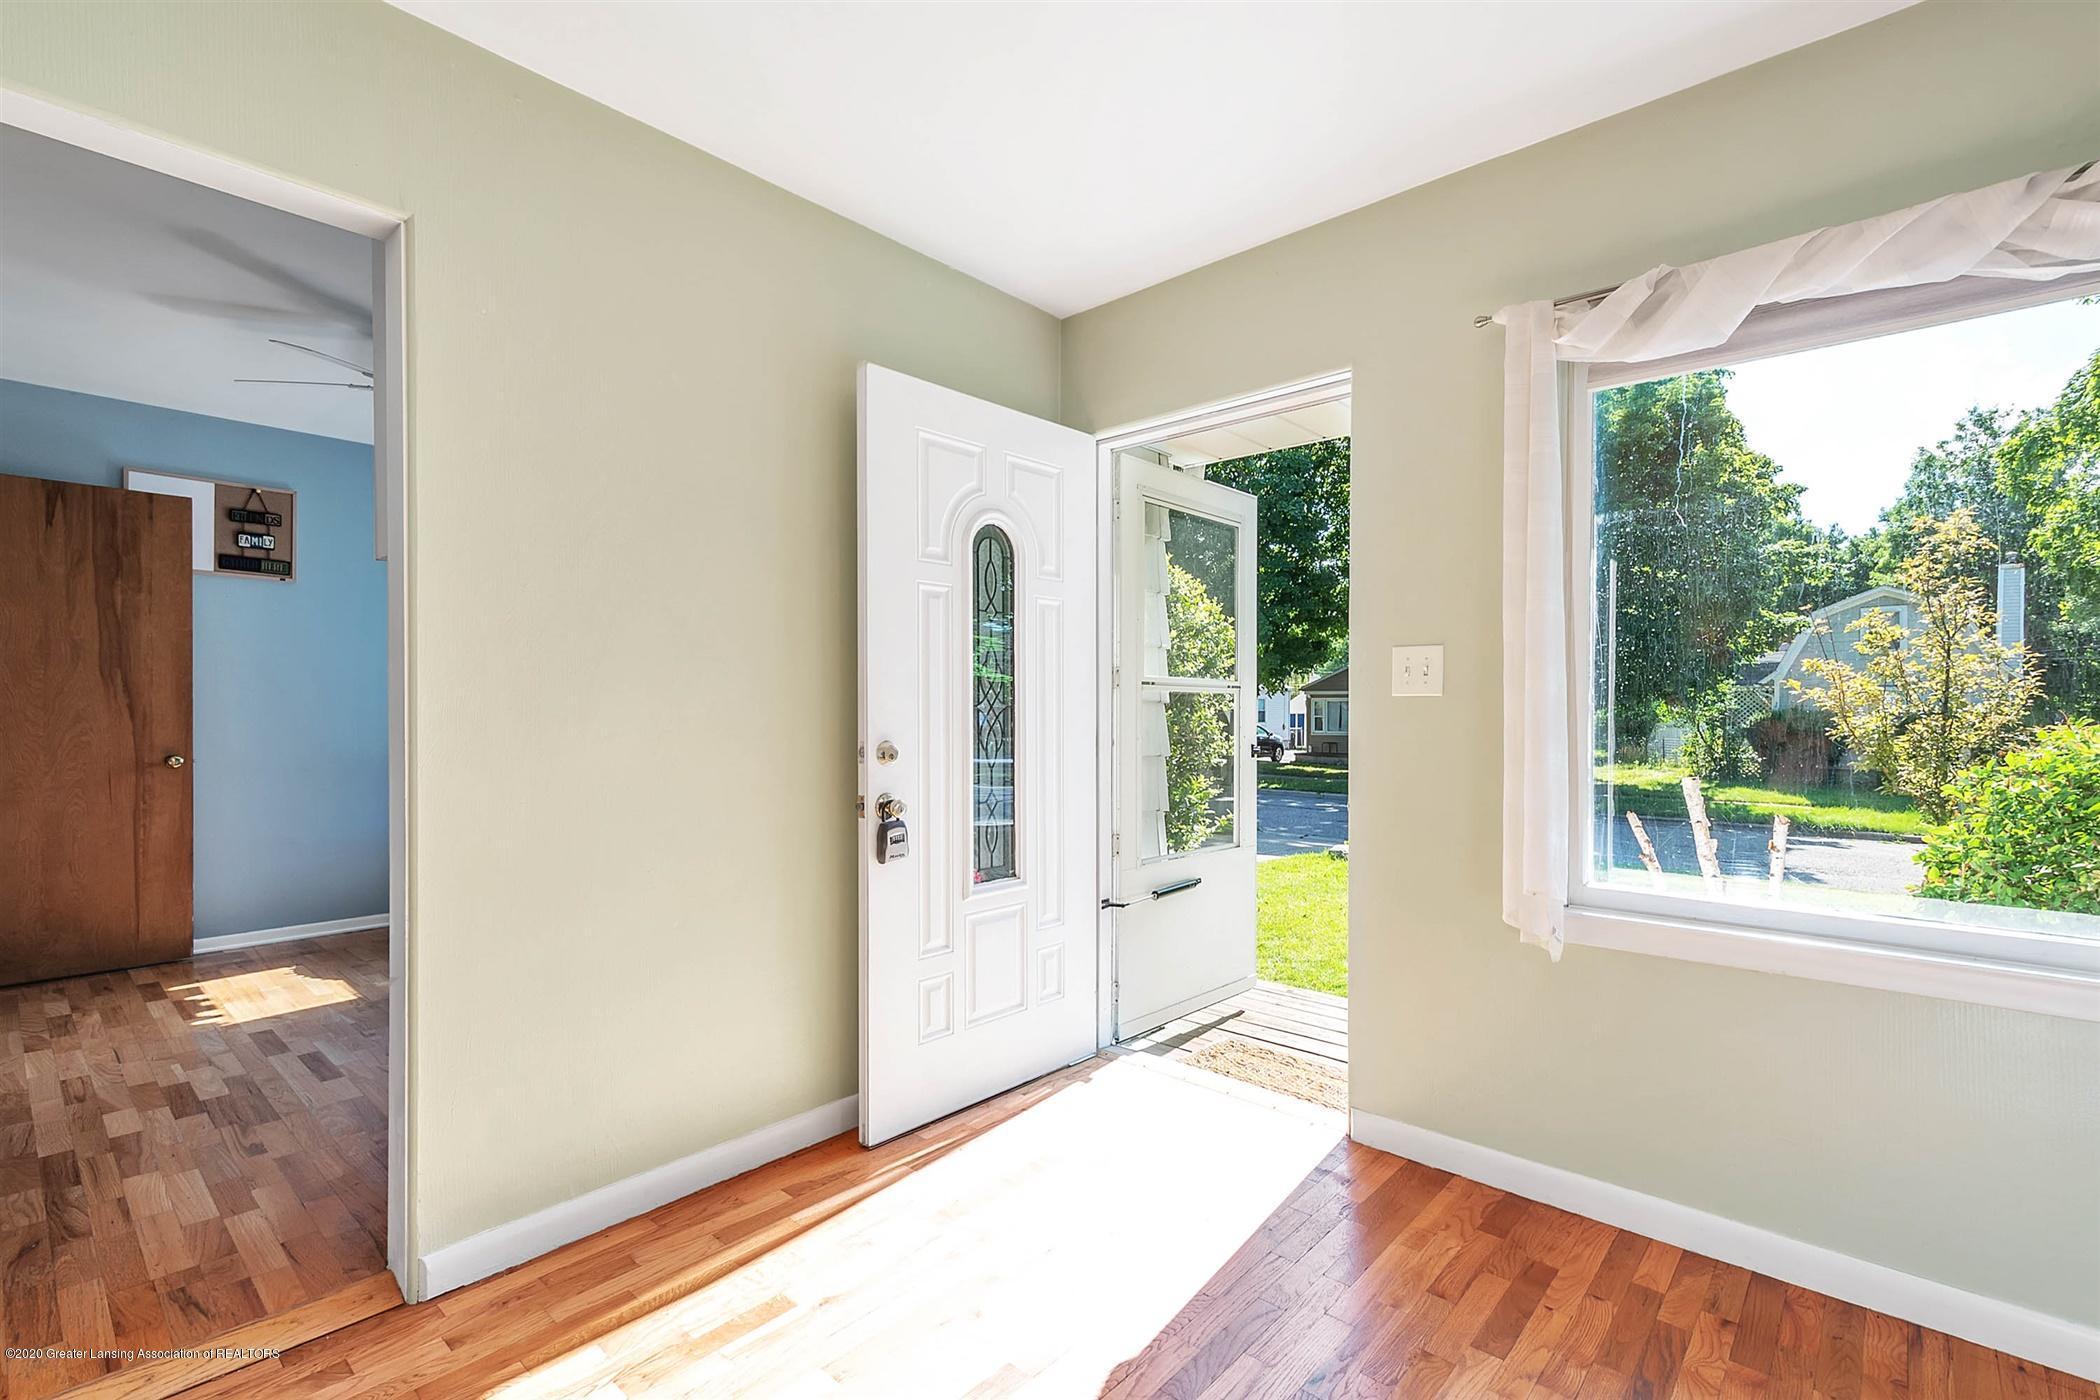 580 Lexington Ave - 06-580 Lexington Ave-WindowStill-Re - 5